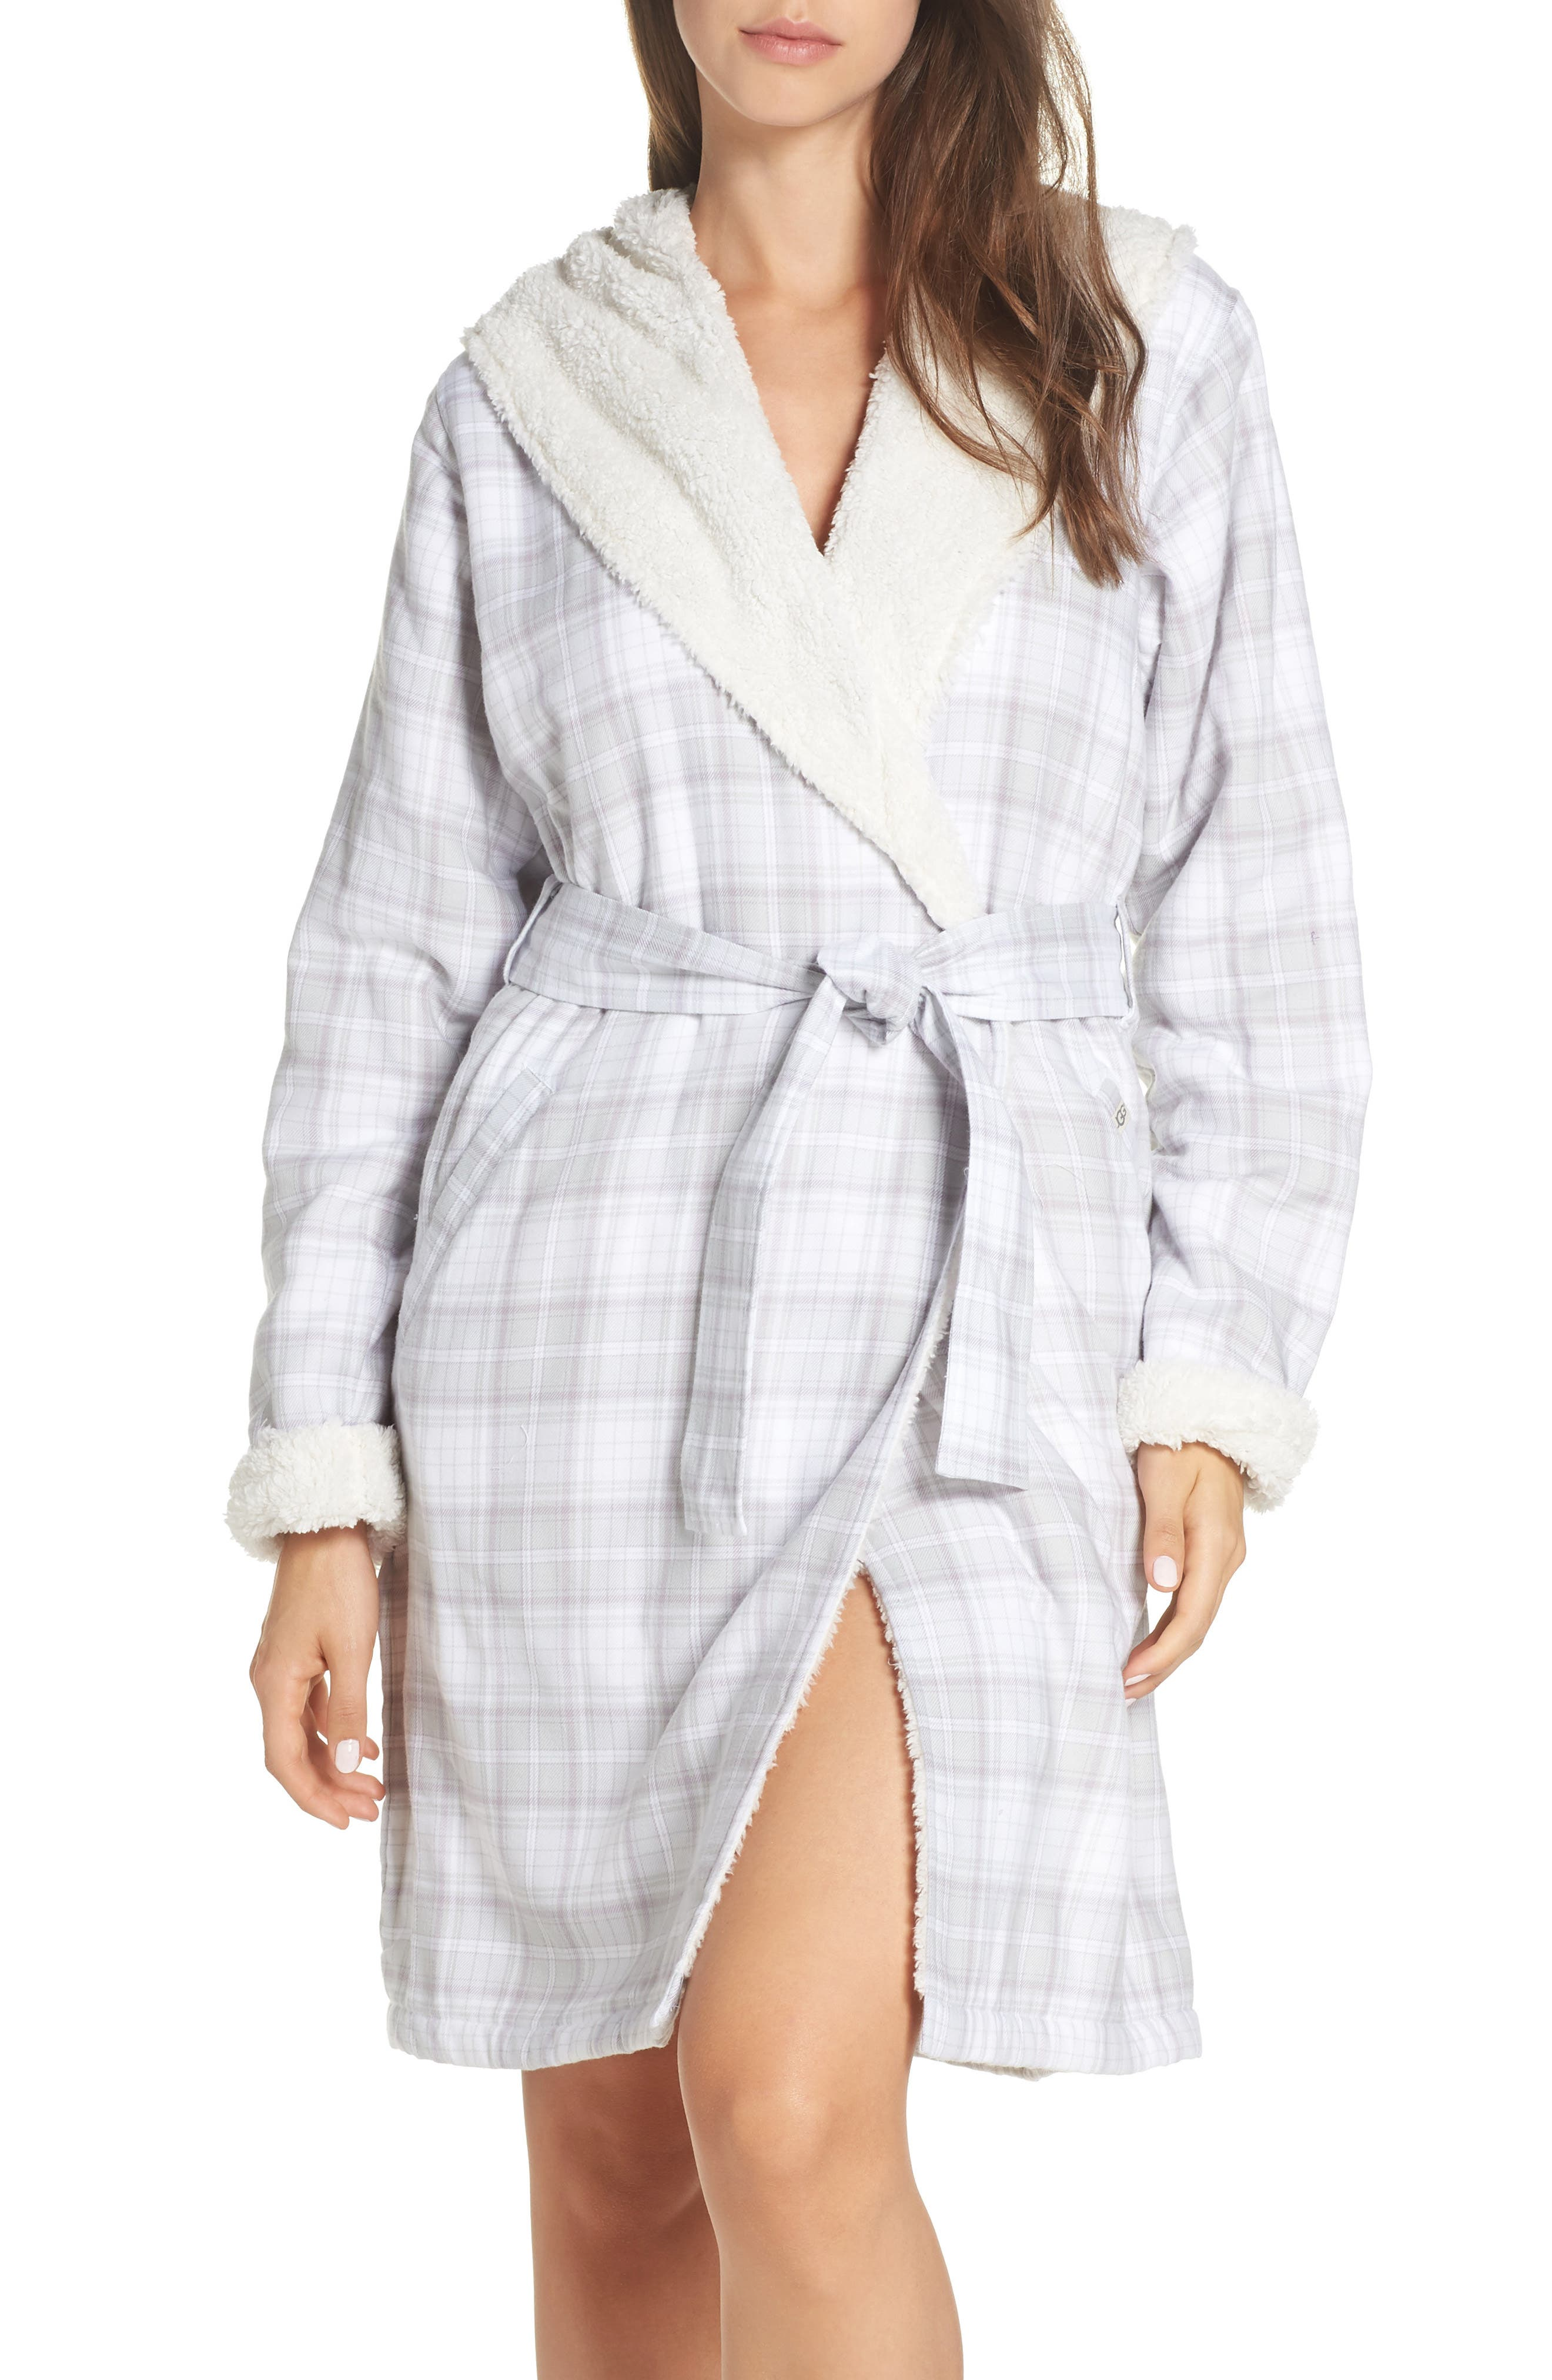 Anika Fleece Lined Flannel Robe,                         Main,                         color, LAVENDER AURA PLAID